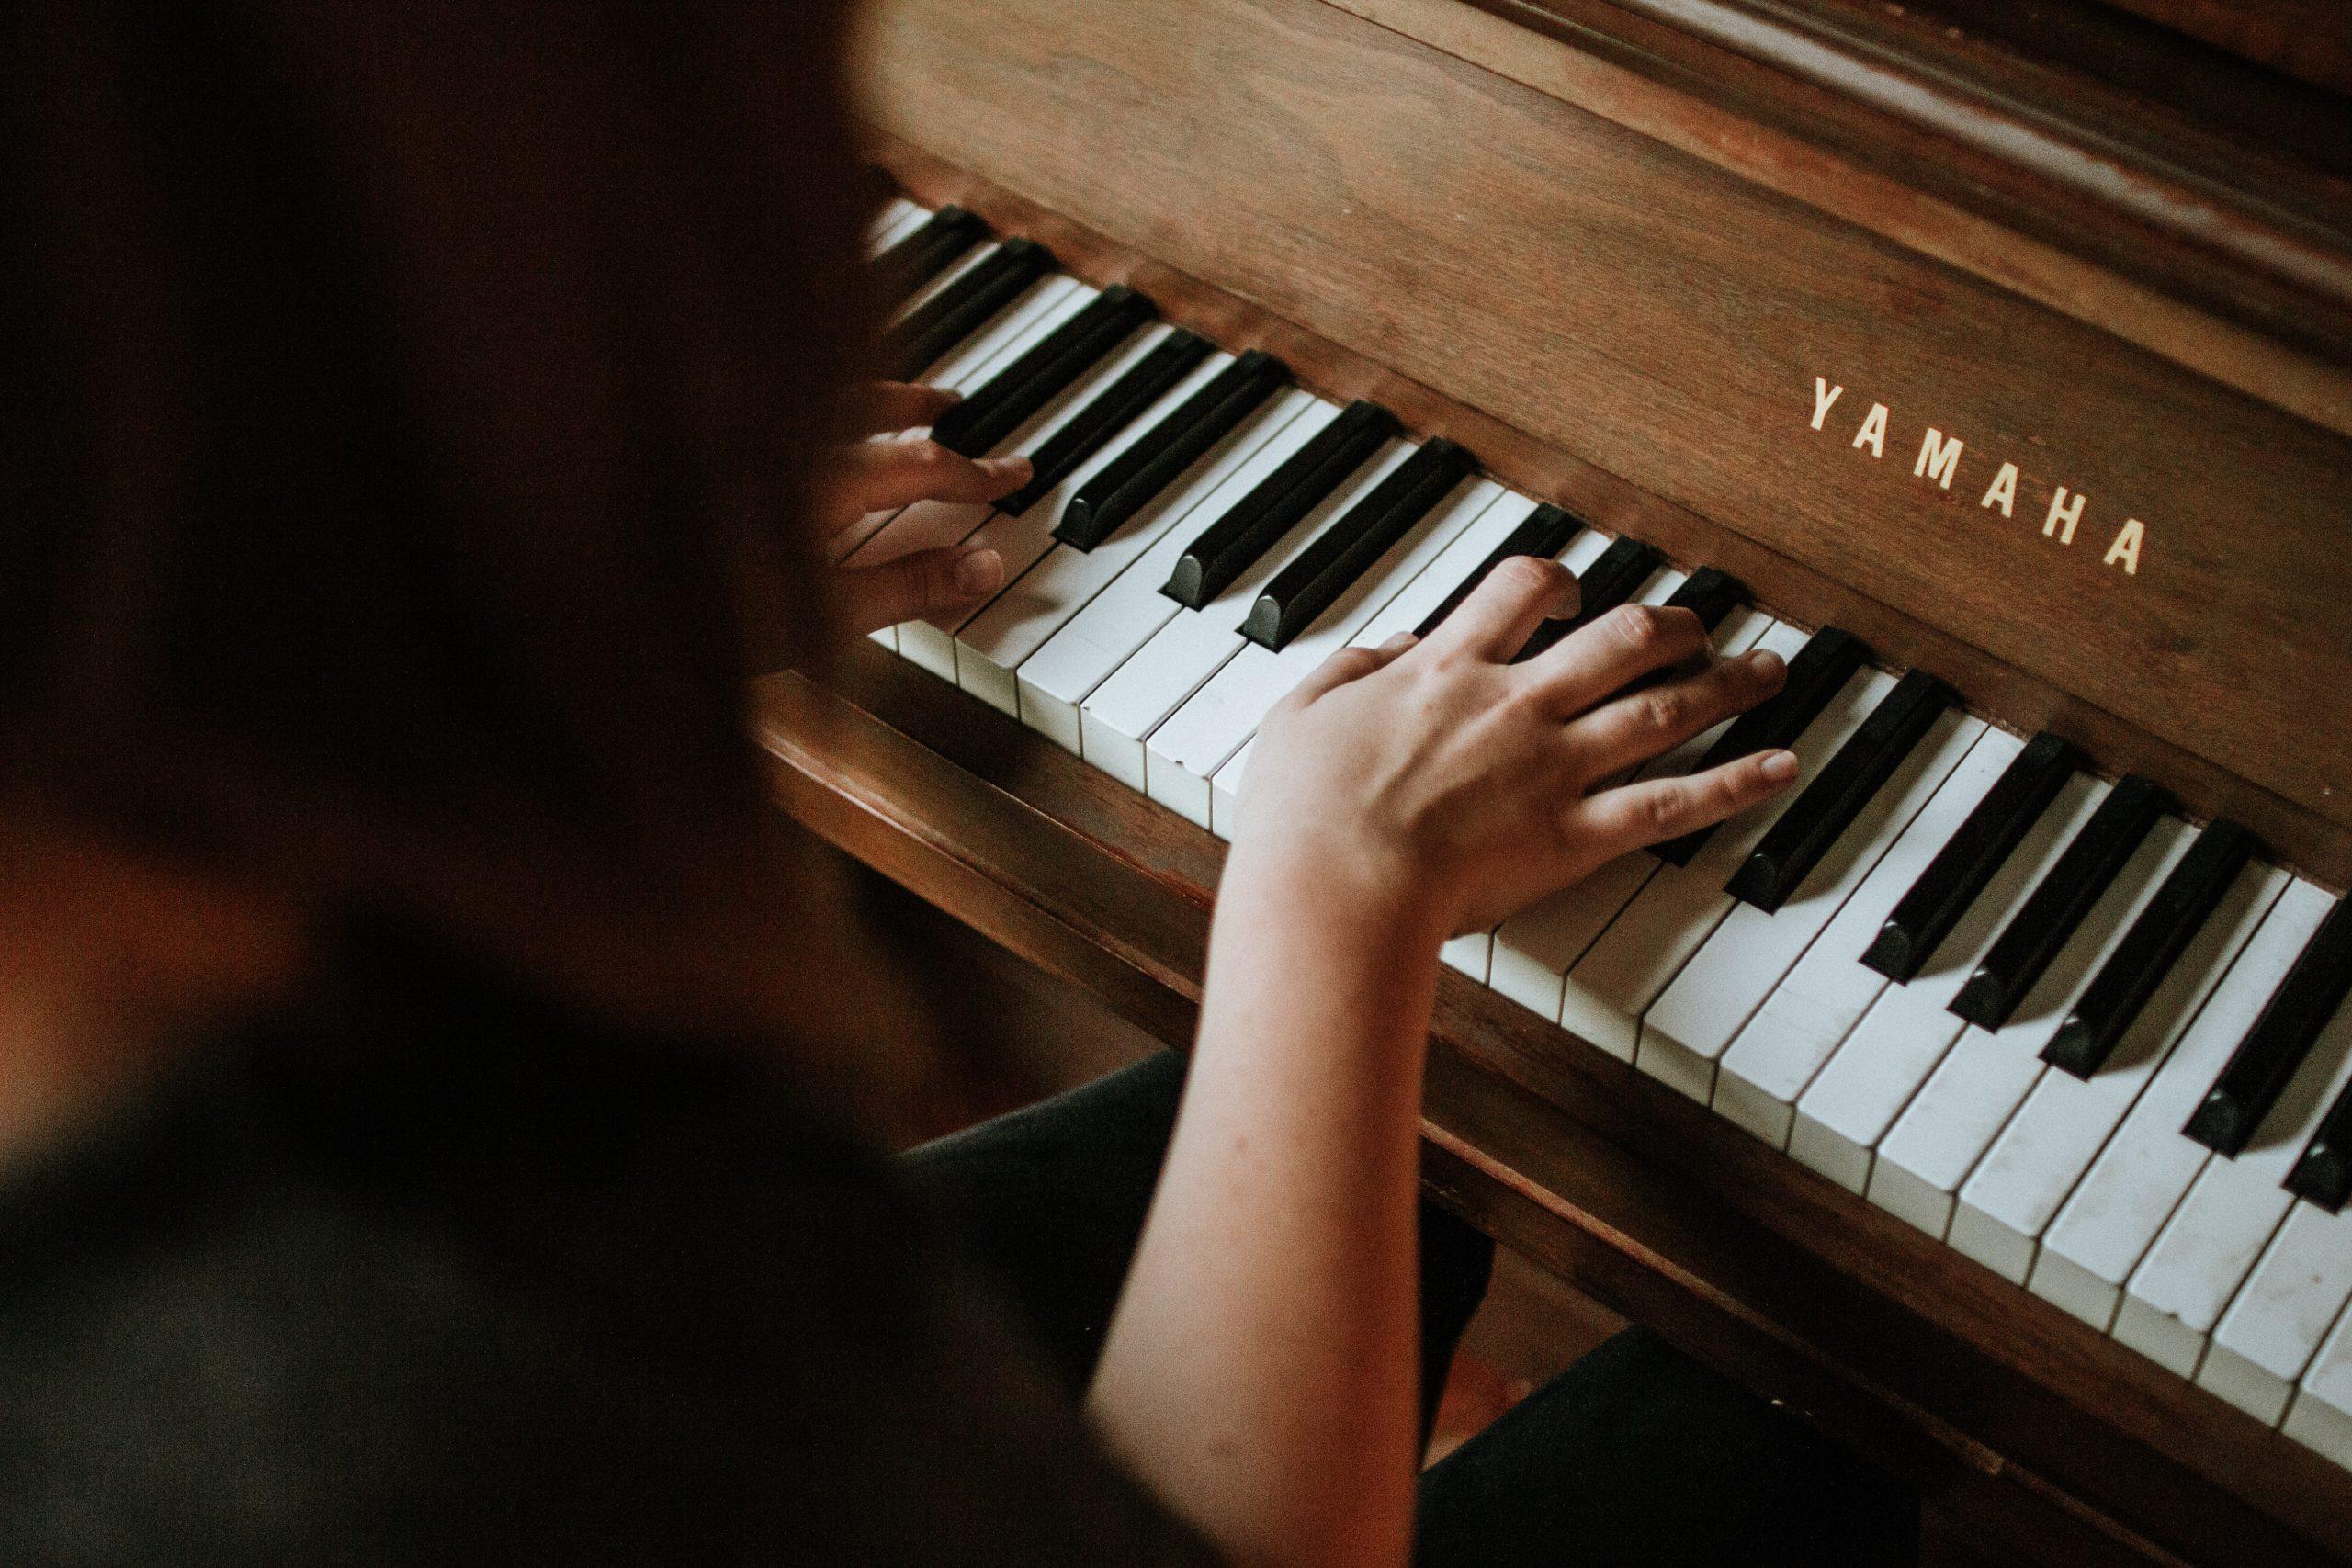 Concurso de música online para músicos instrumentistas